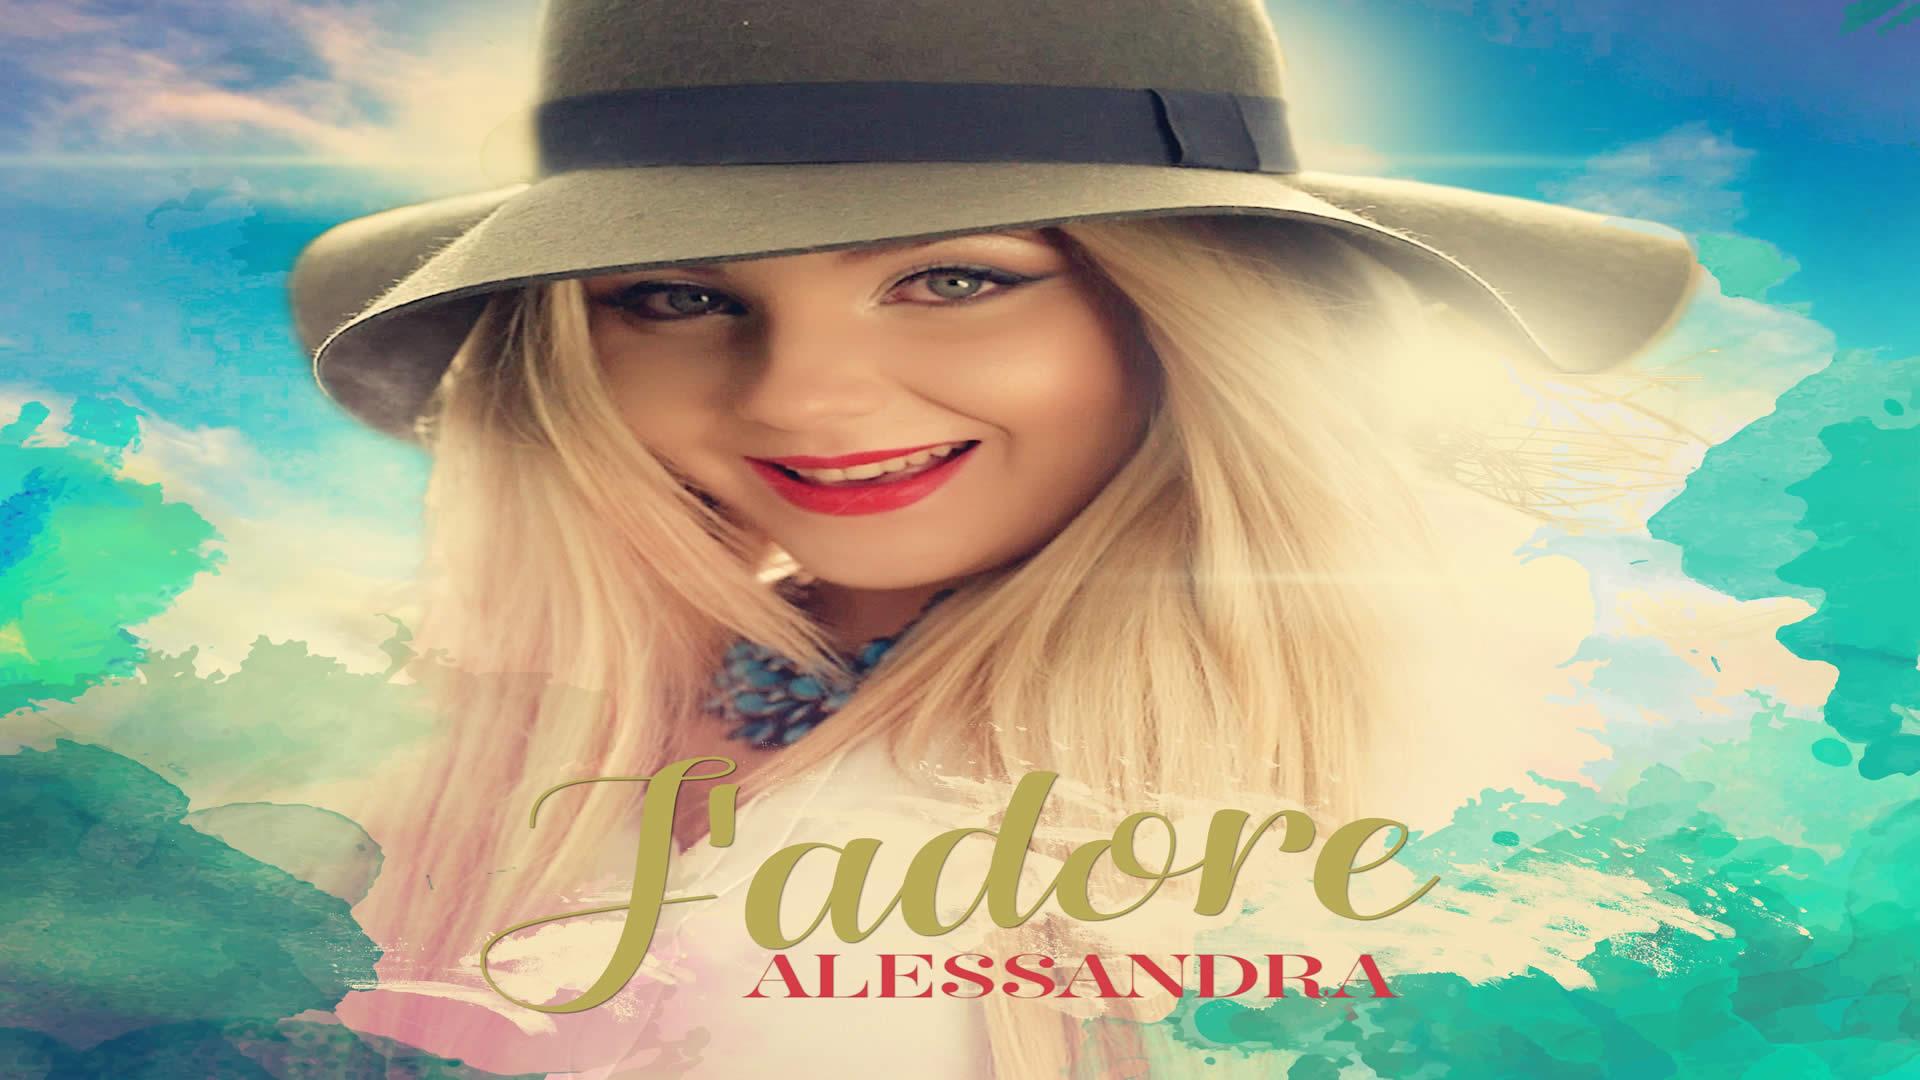 Alessandra - J'adore